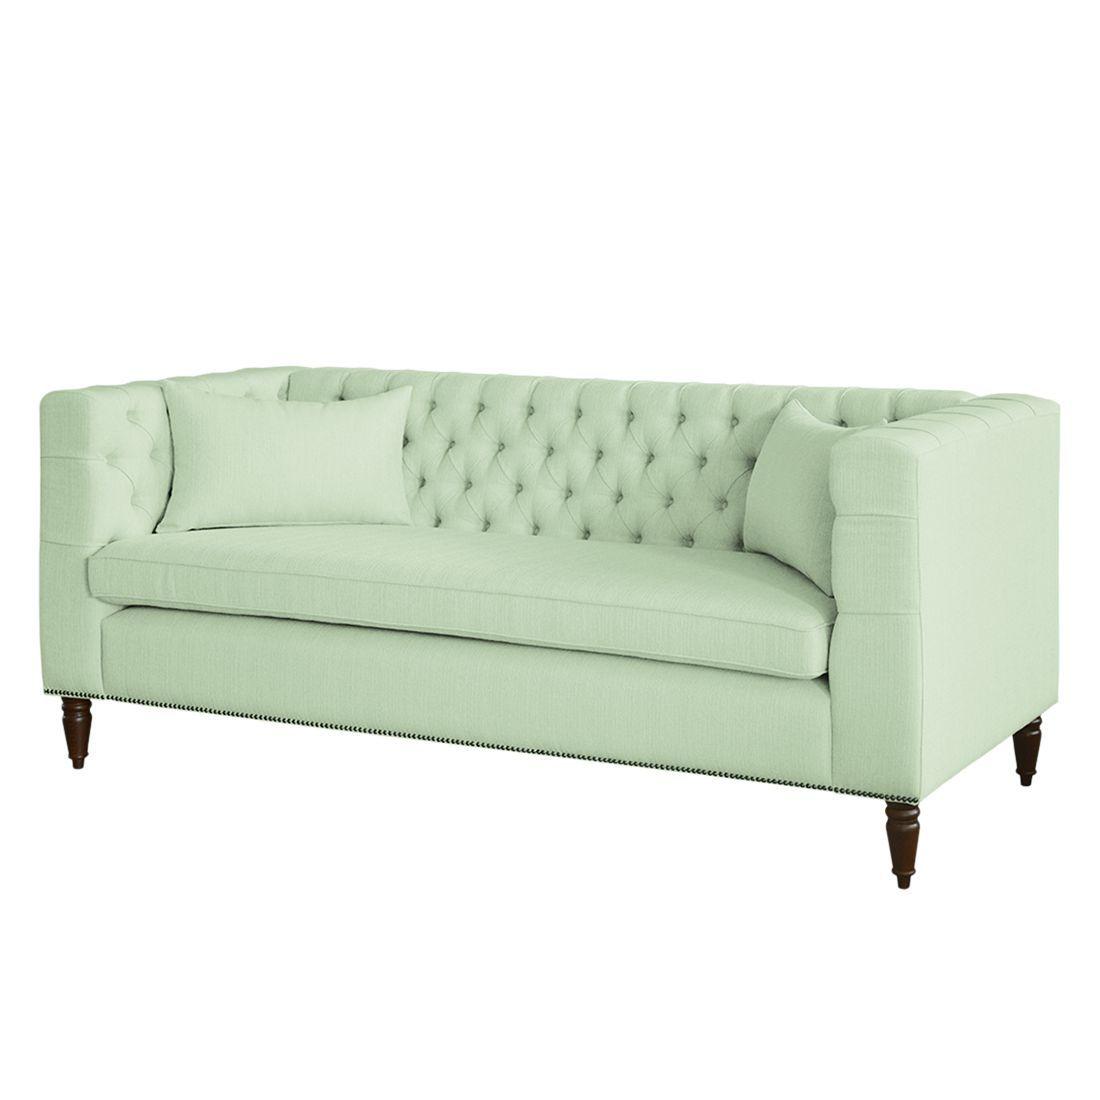 Ensemble De Salon Sherbrooke 3 2 In 2020 Sofas Big Sofa Kaufen Und 3 Sitzer Sofa